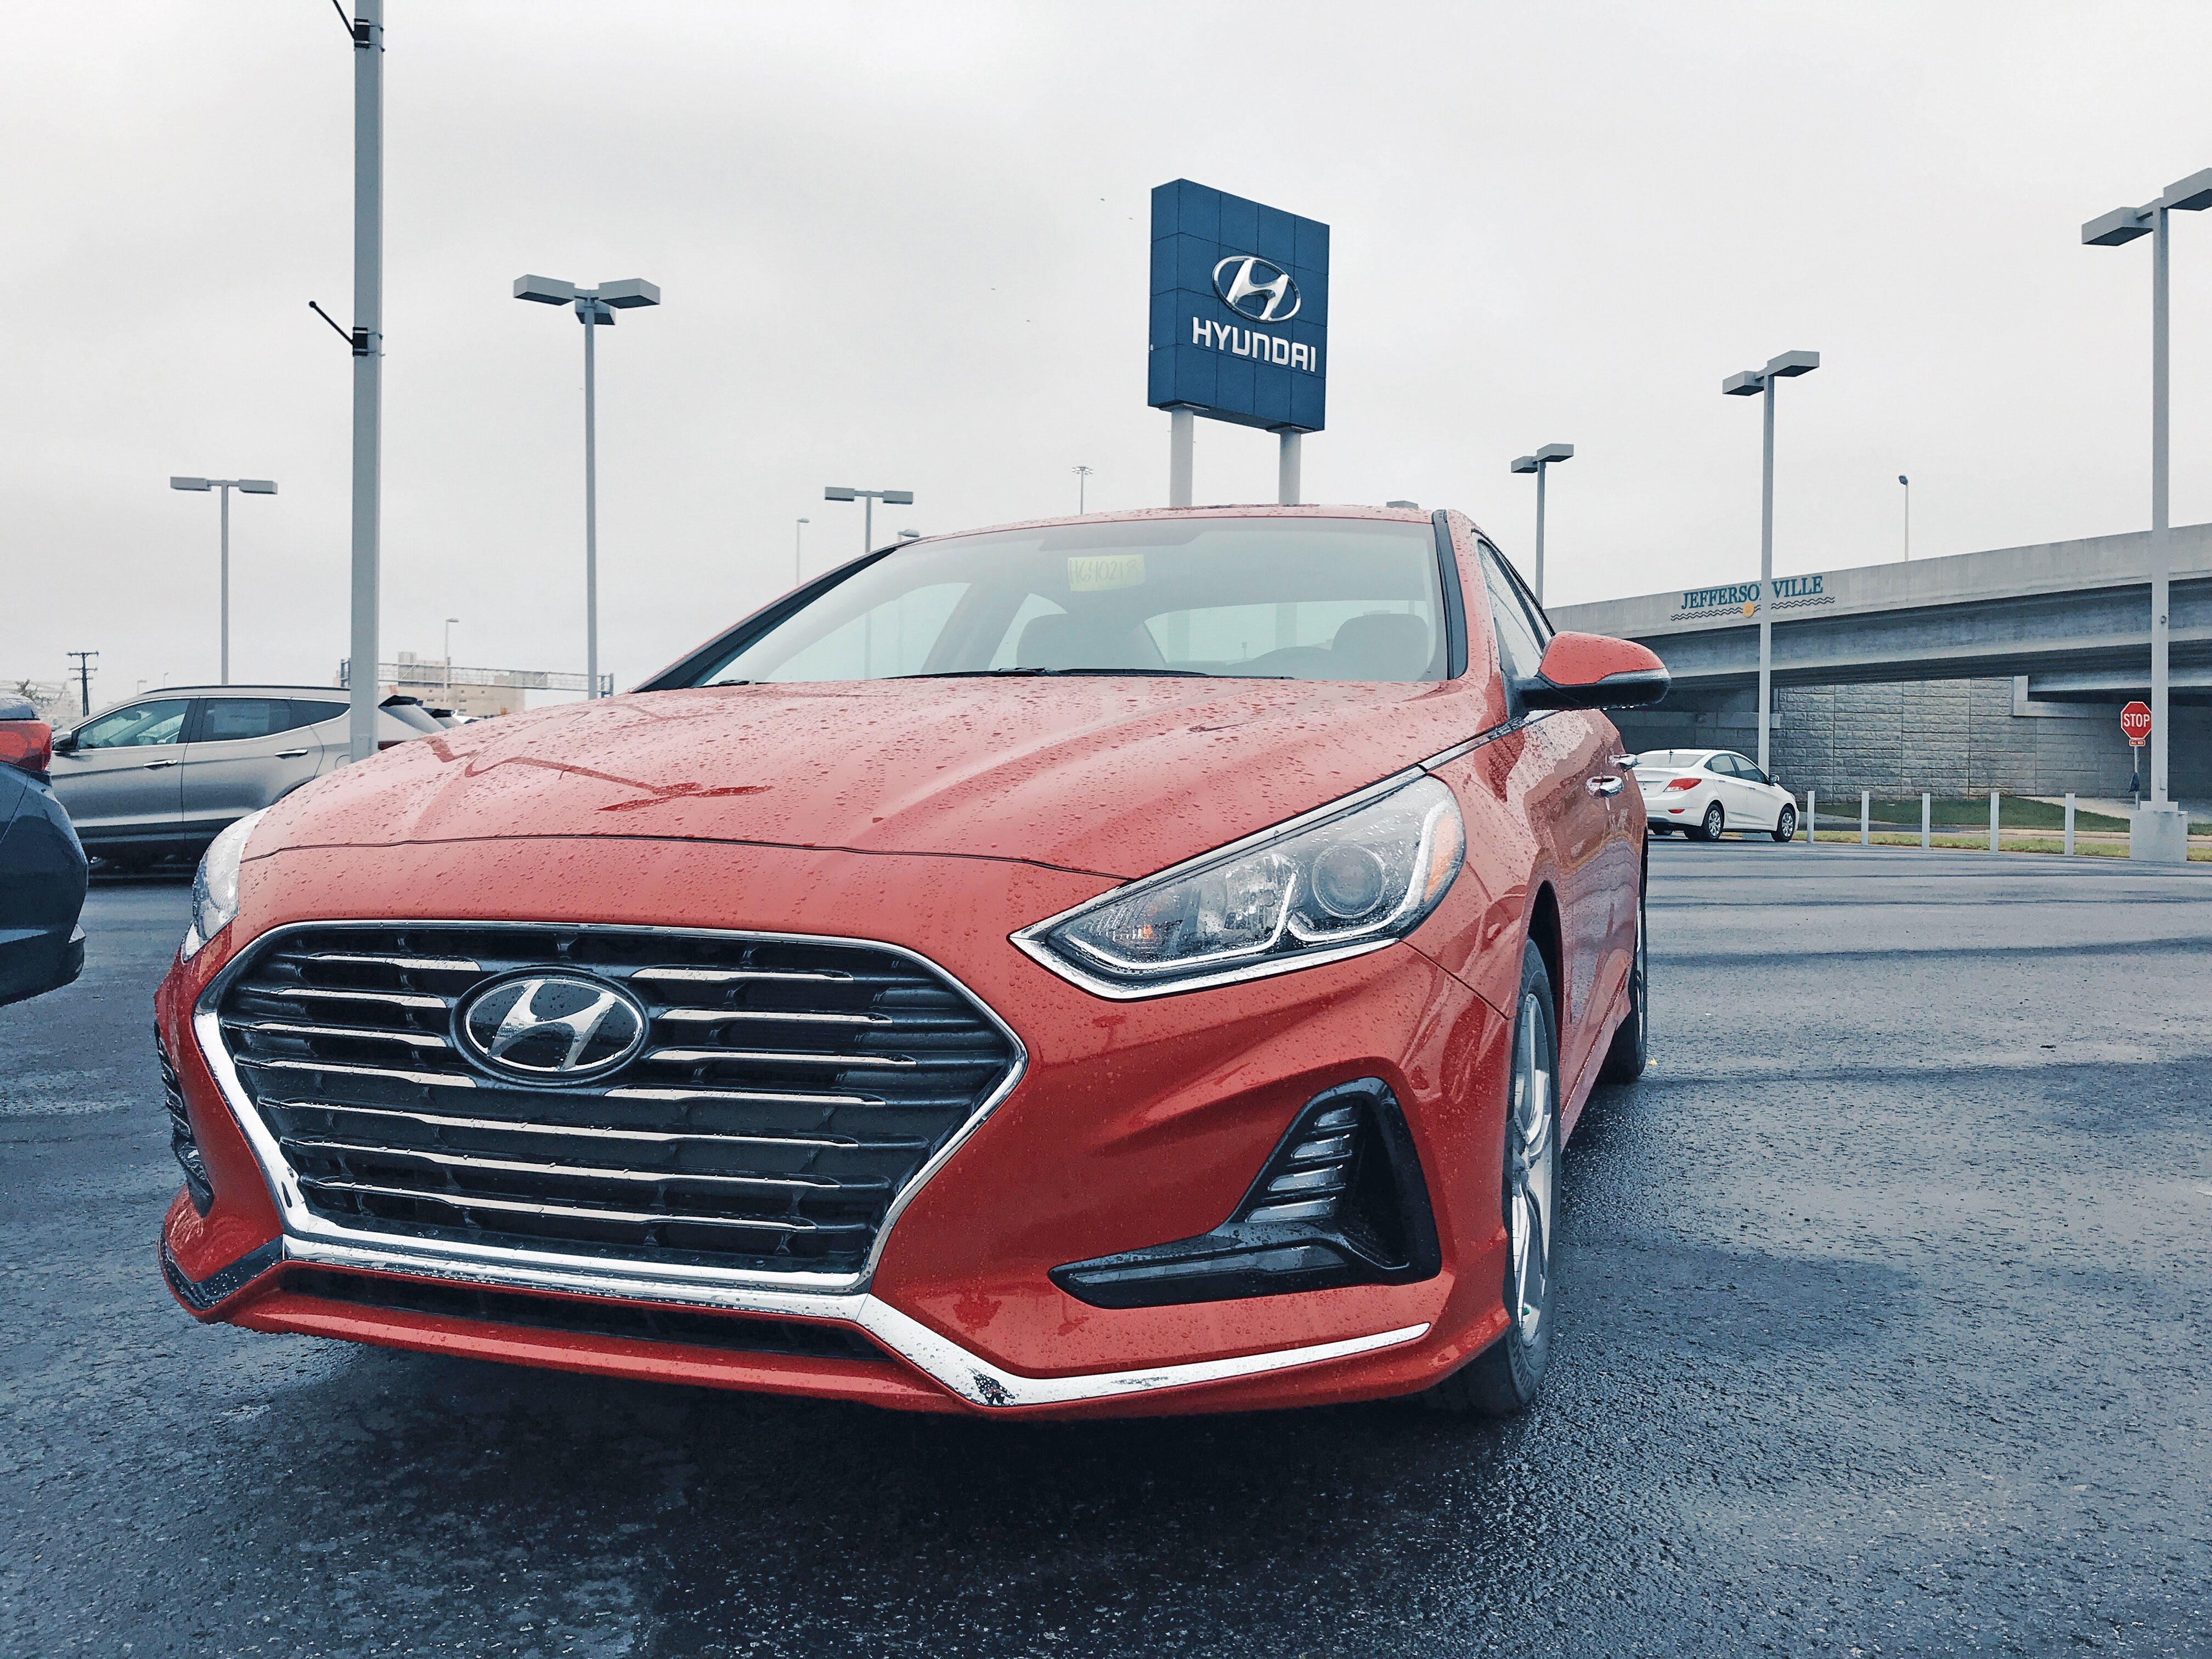 Bachman Hyundai image 4